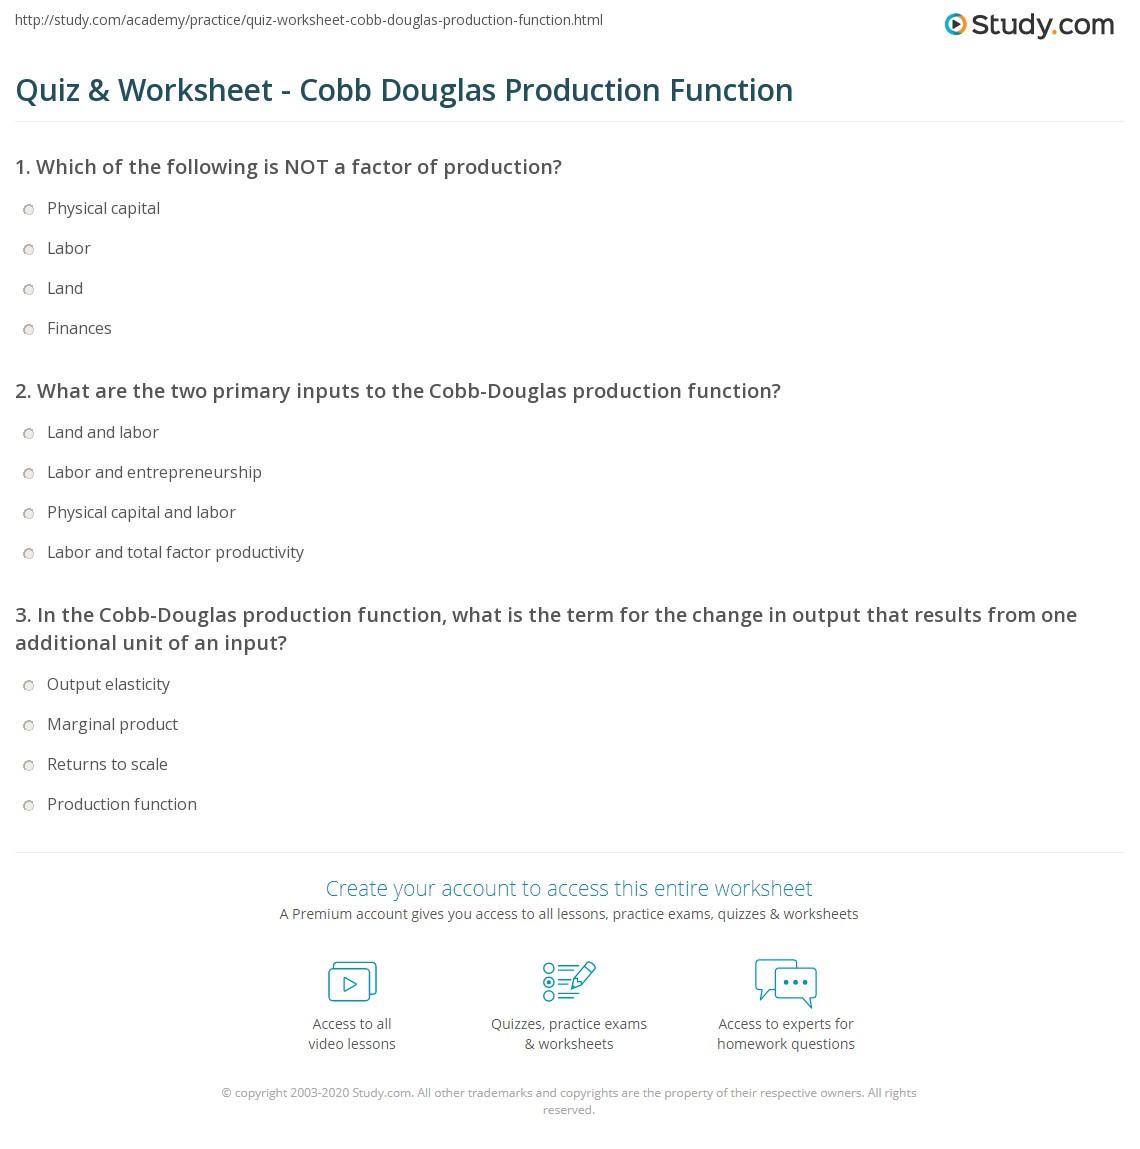 Douglas Factors Worksheet Printable Worksheets And Activities For Teachers Parents Tutors And Homeschool Families